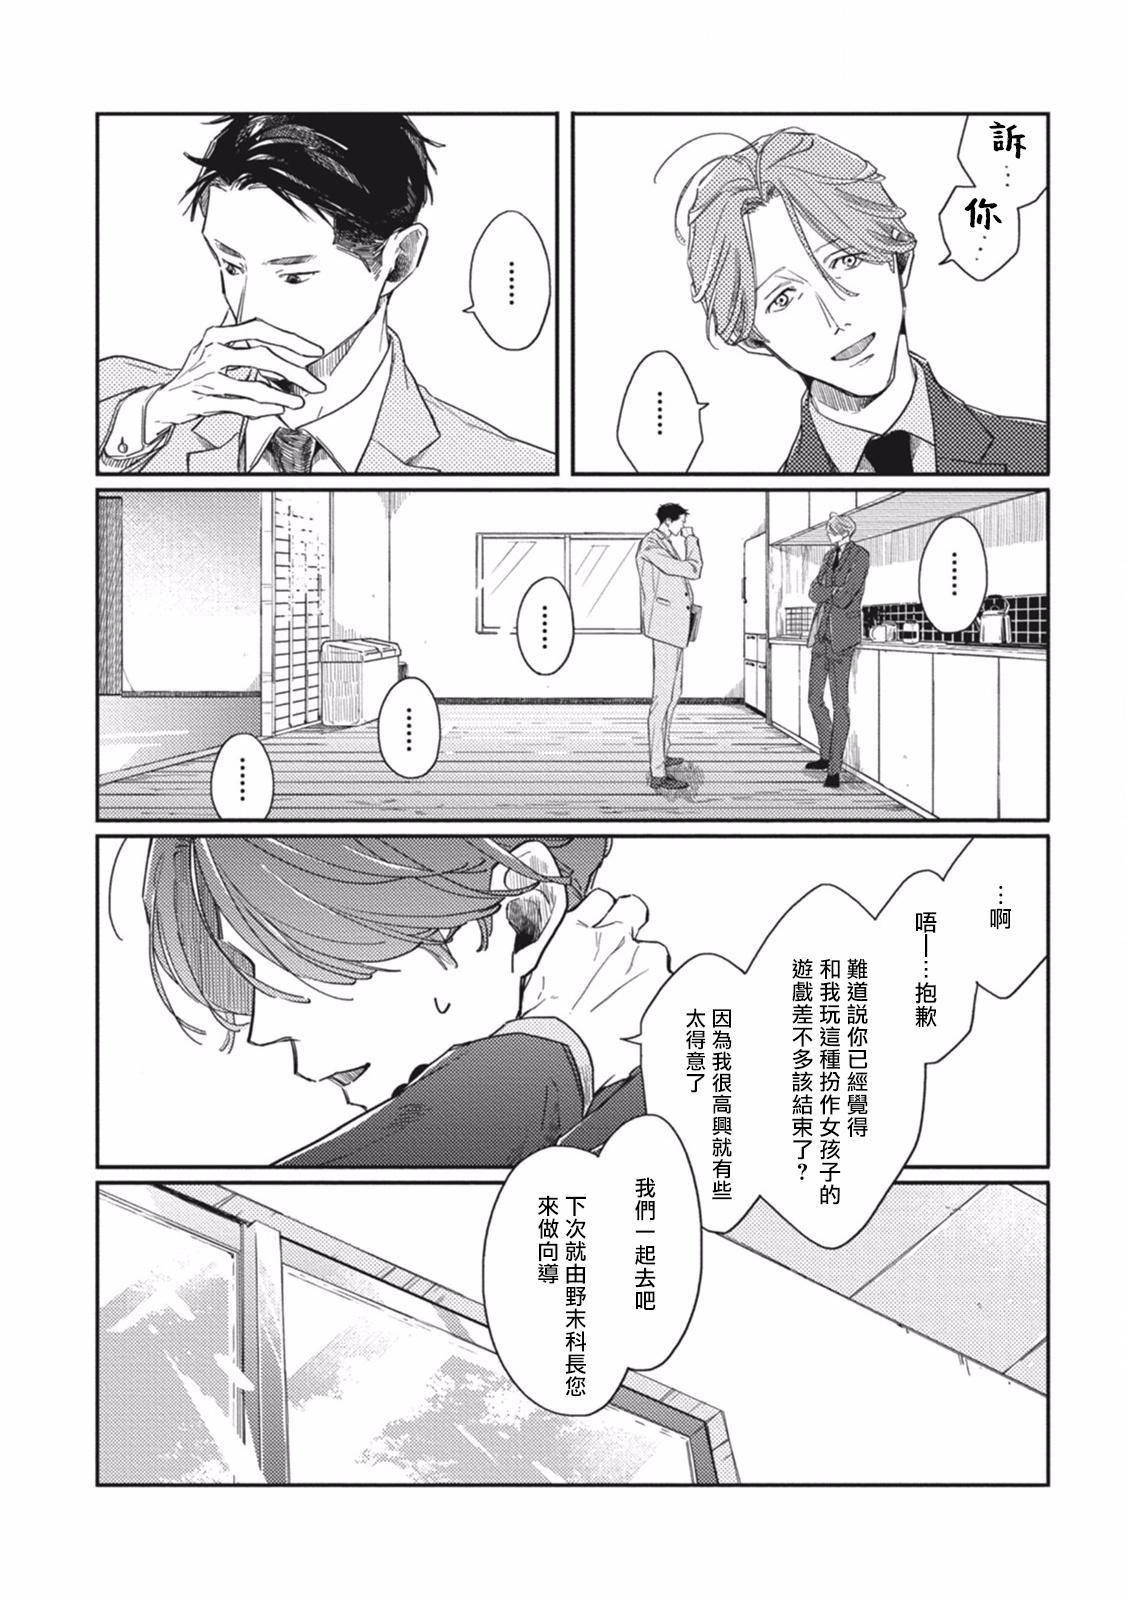 [Sagan Sagan] Old-fashioned Cupcake Ch. 1-2 [Chinese] [拾荒者汉化组] [Digital] 74